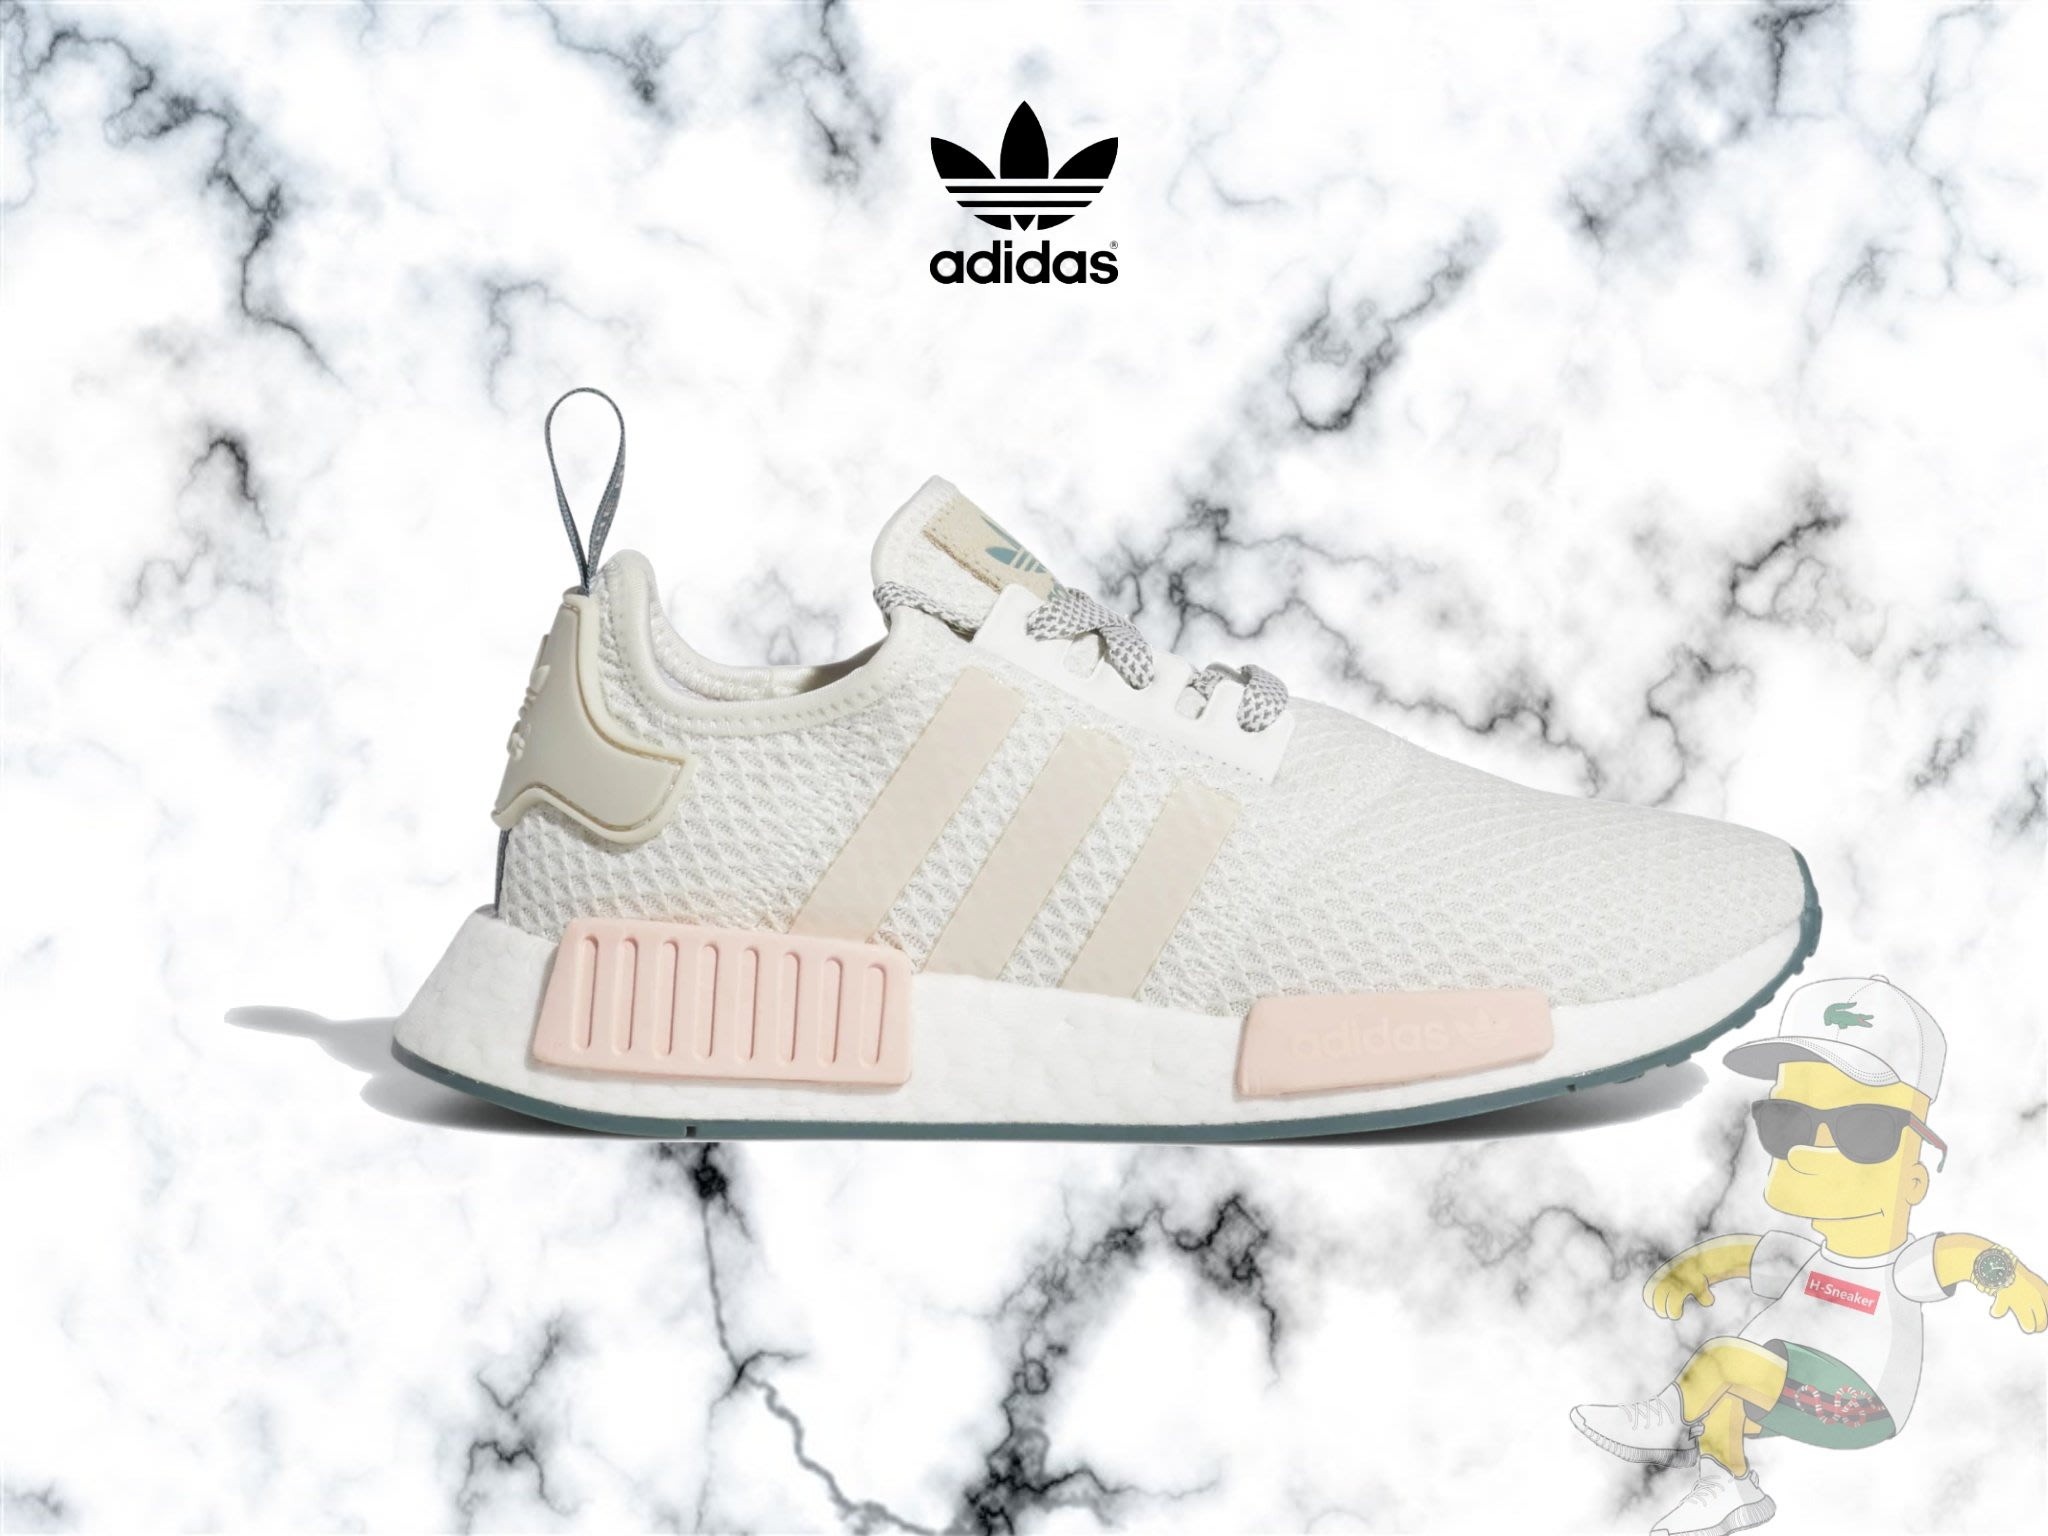 reputable site 476d0 2e27d H-Sneaker】全新ADIDAS ORIGINALS NMD R1 W 粉白灰網布編織女鞋 ...